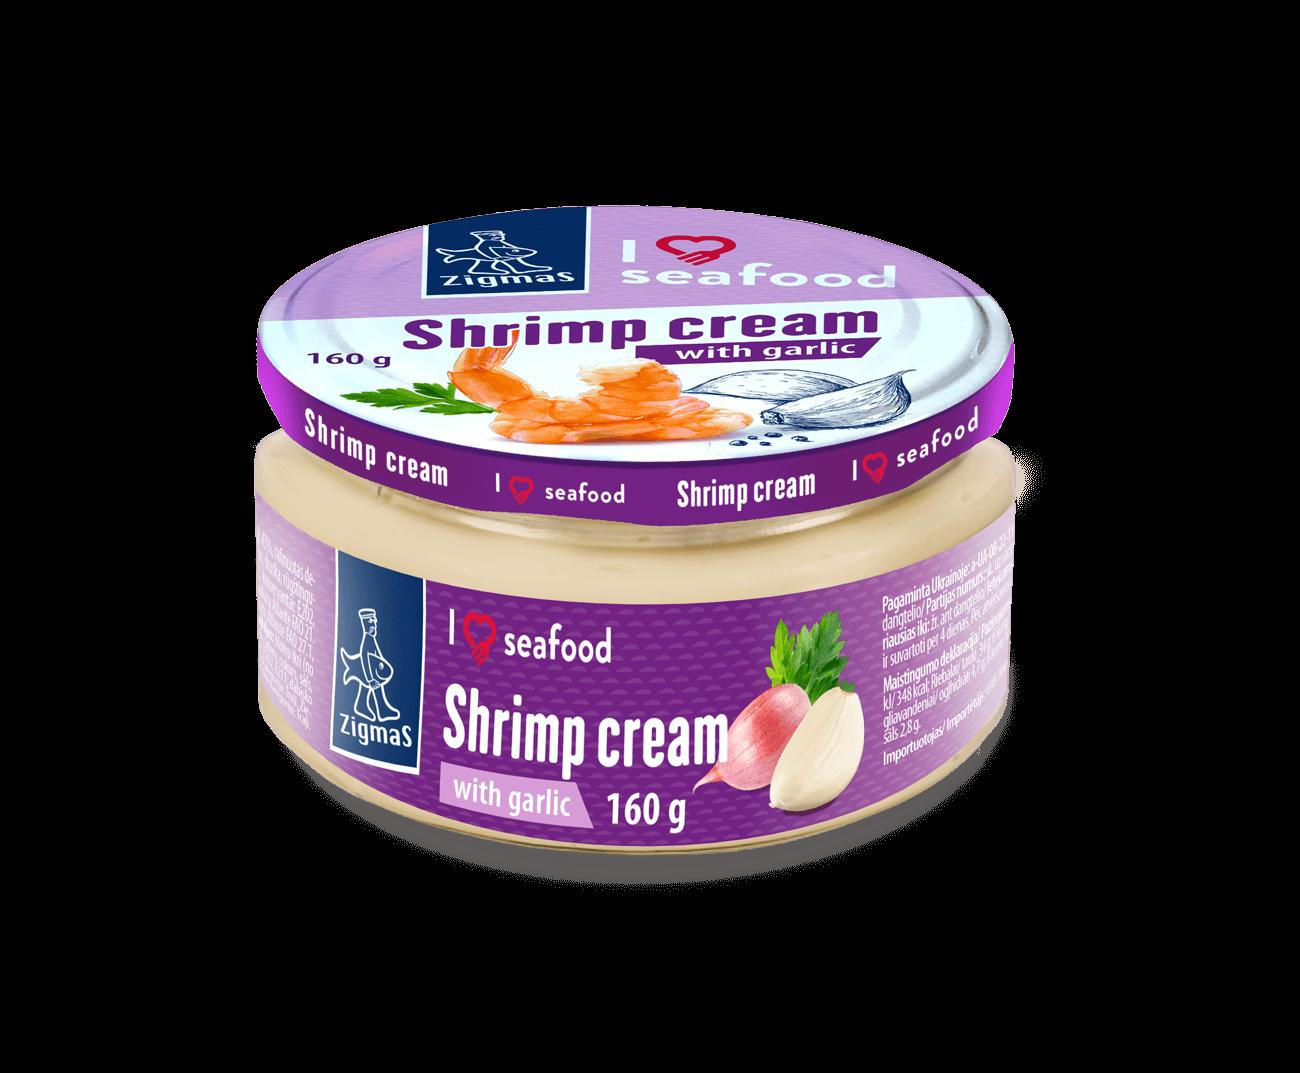 Shrimp cream with garlic